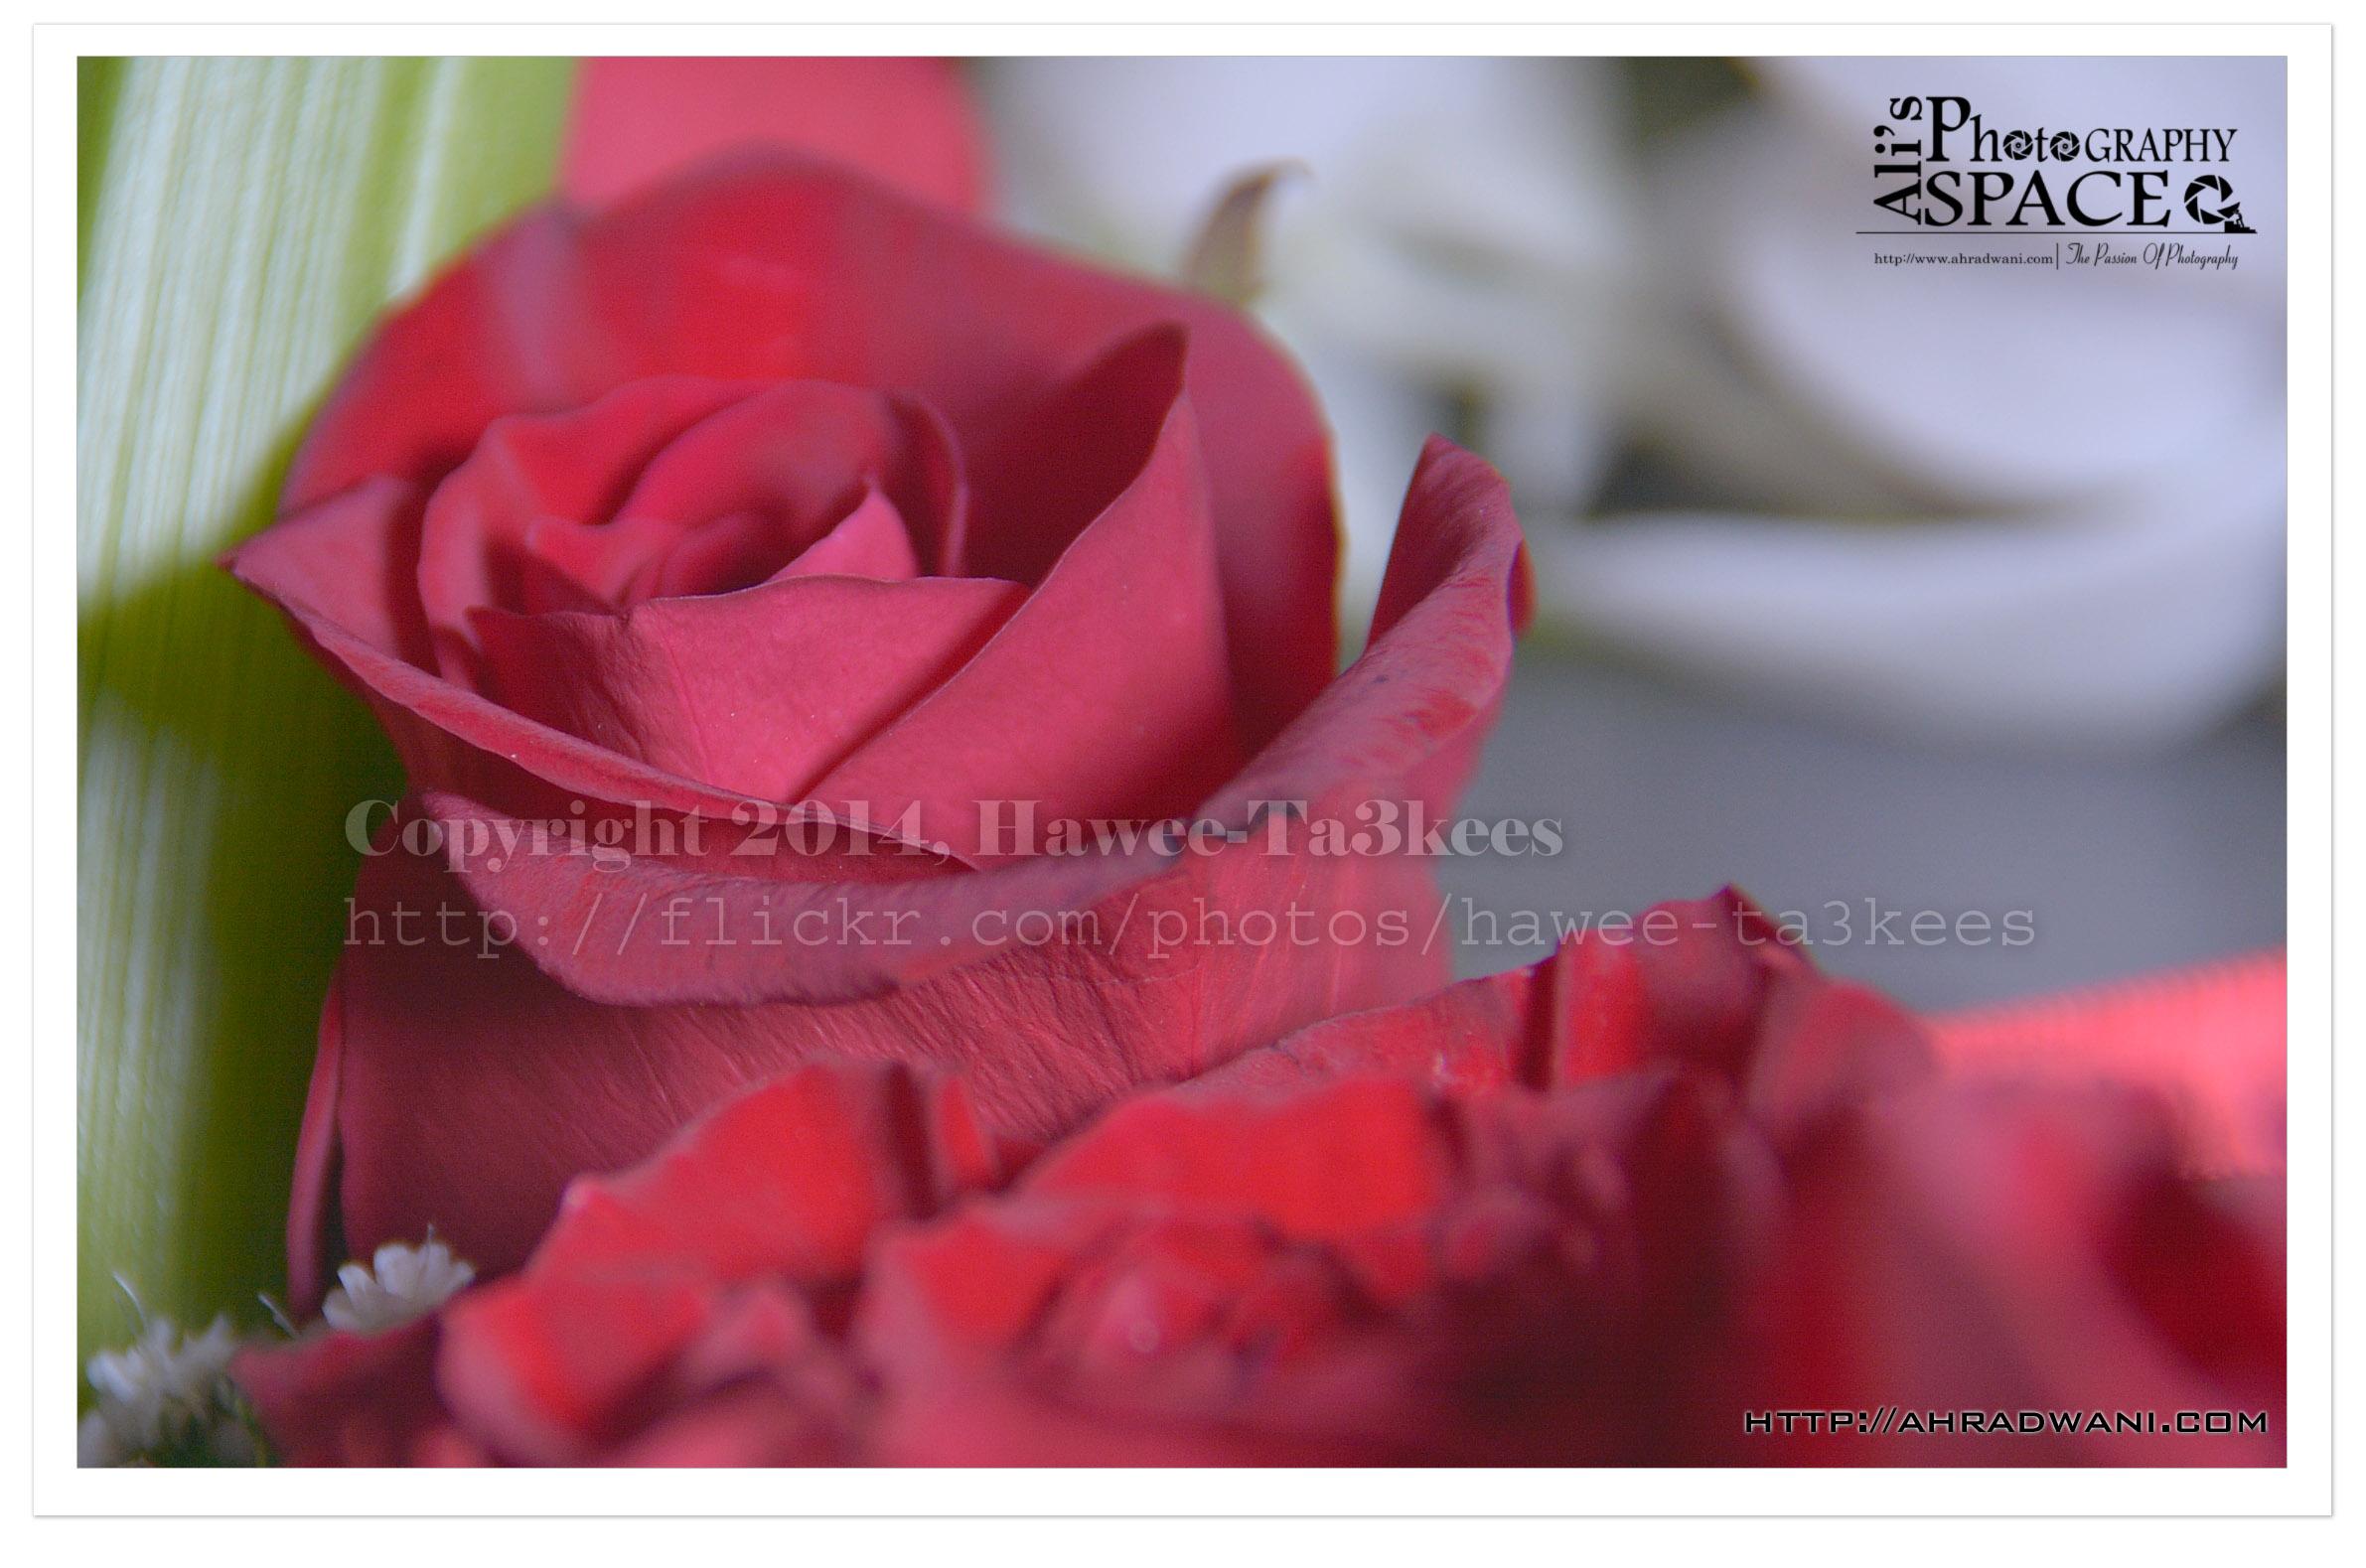 DSC_5454 copy